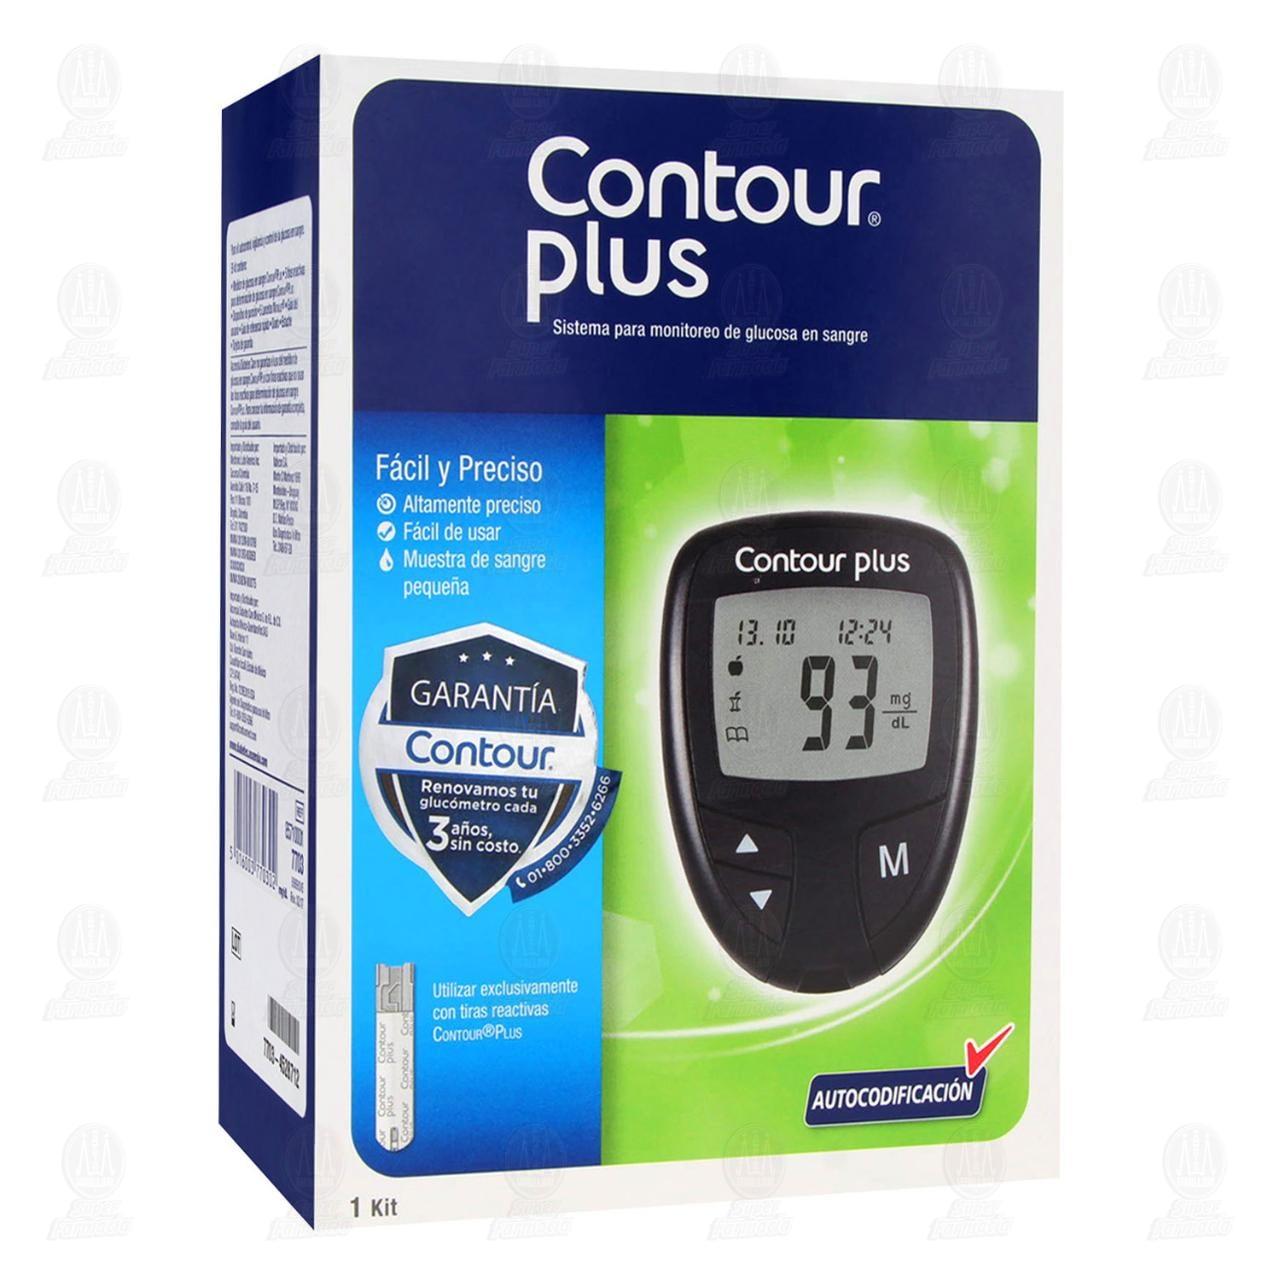 Comprar Contour Plus 1 Kit Sistema de Glucosa en Farmacias Guadalajara